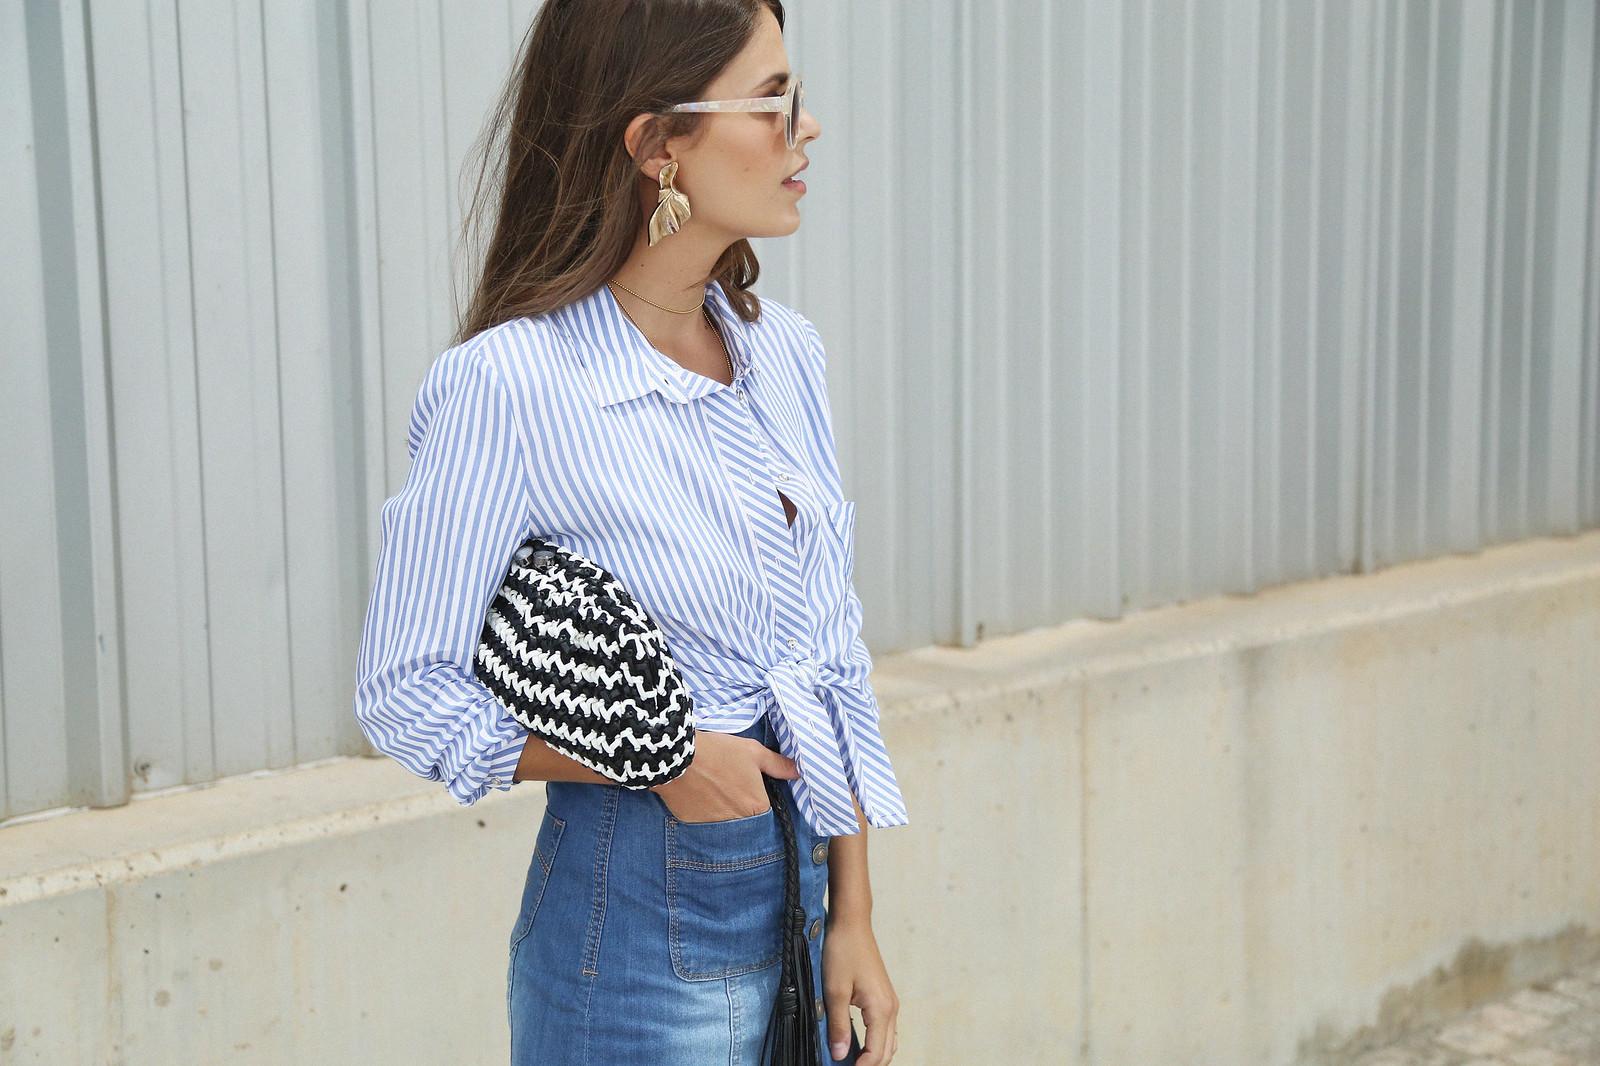 jessie chanes seams for a desire denim skirt stripes shirt-6